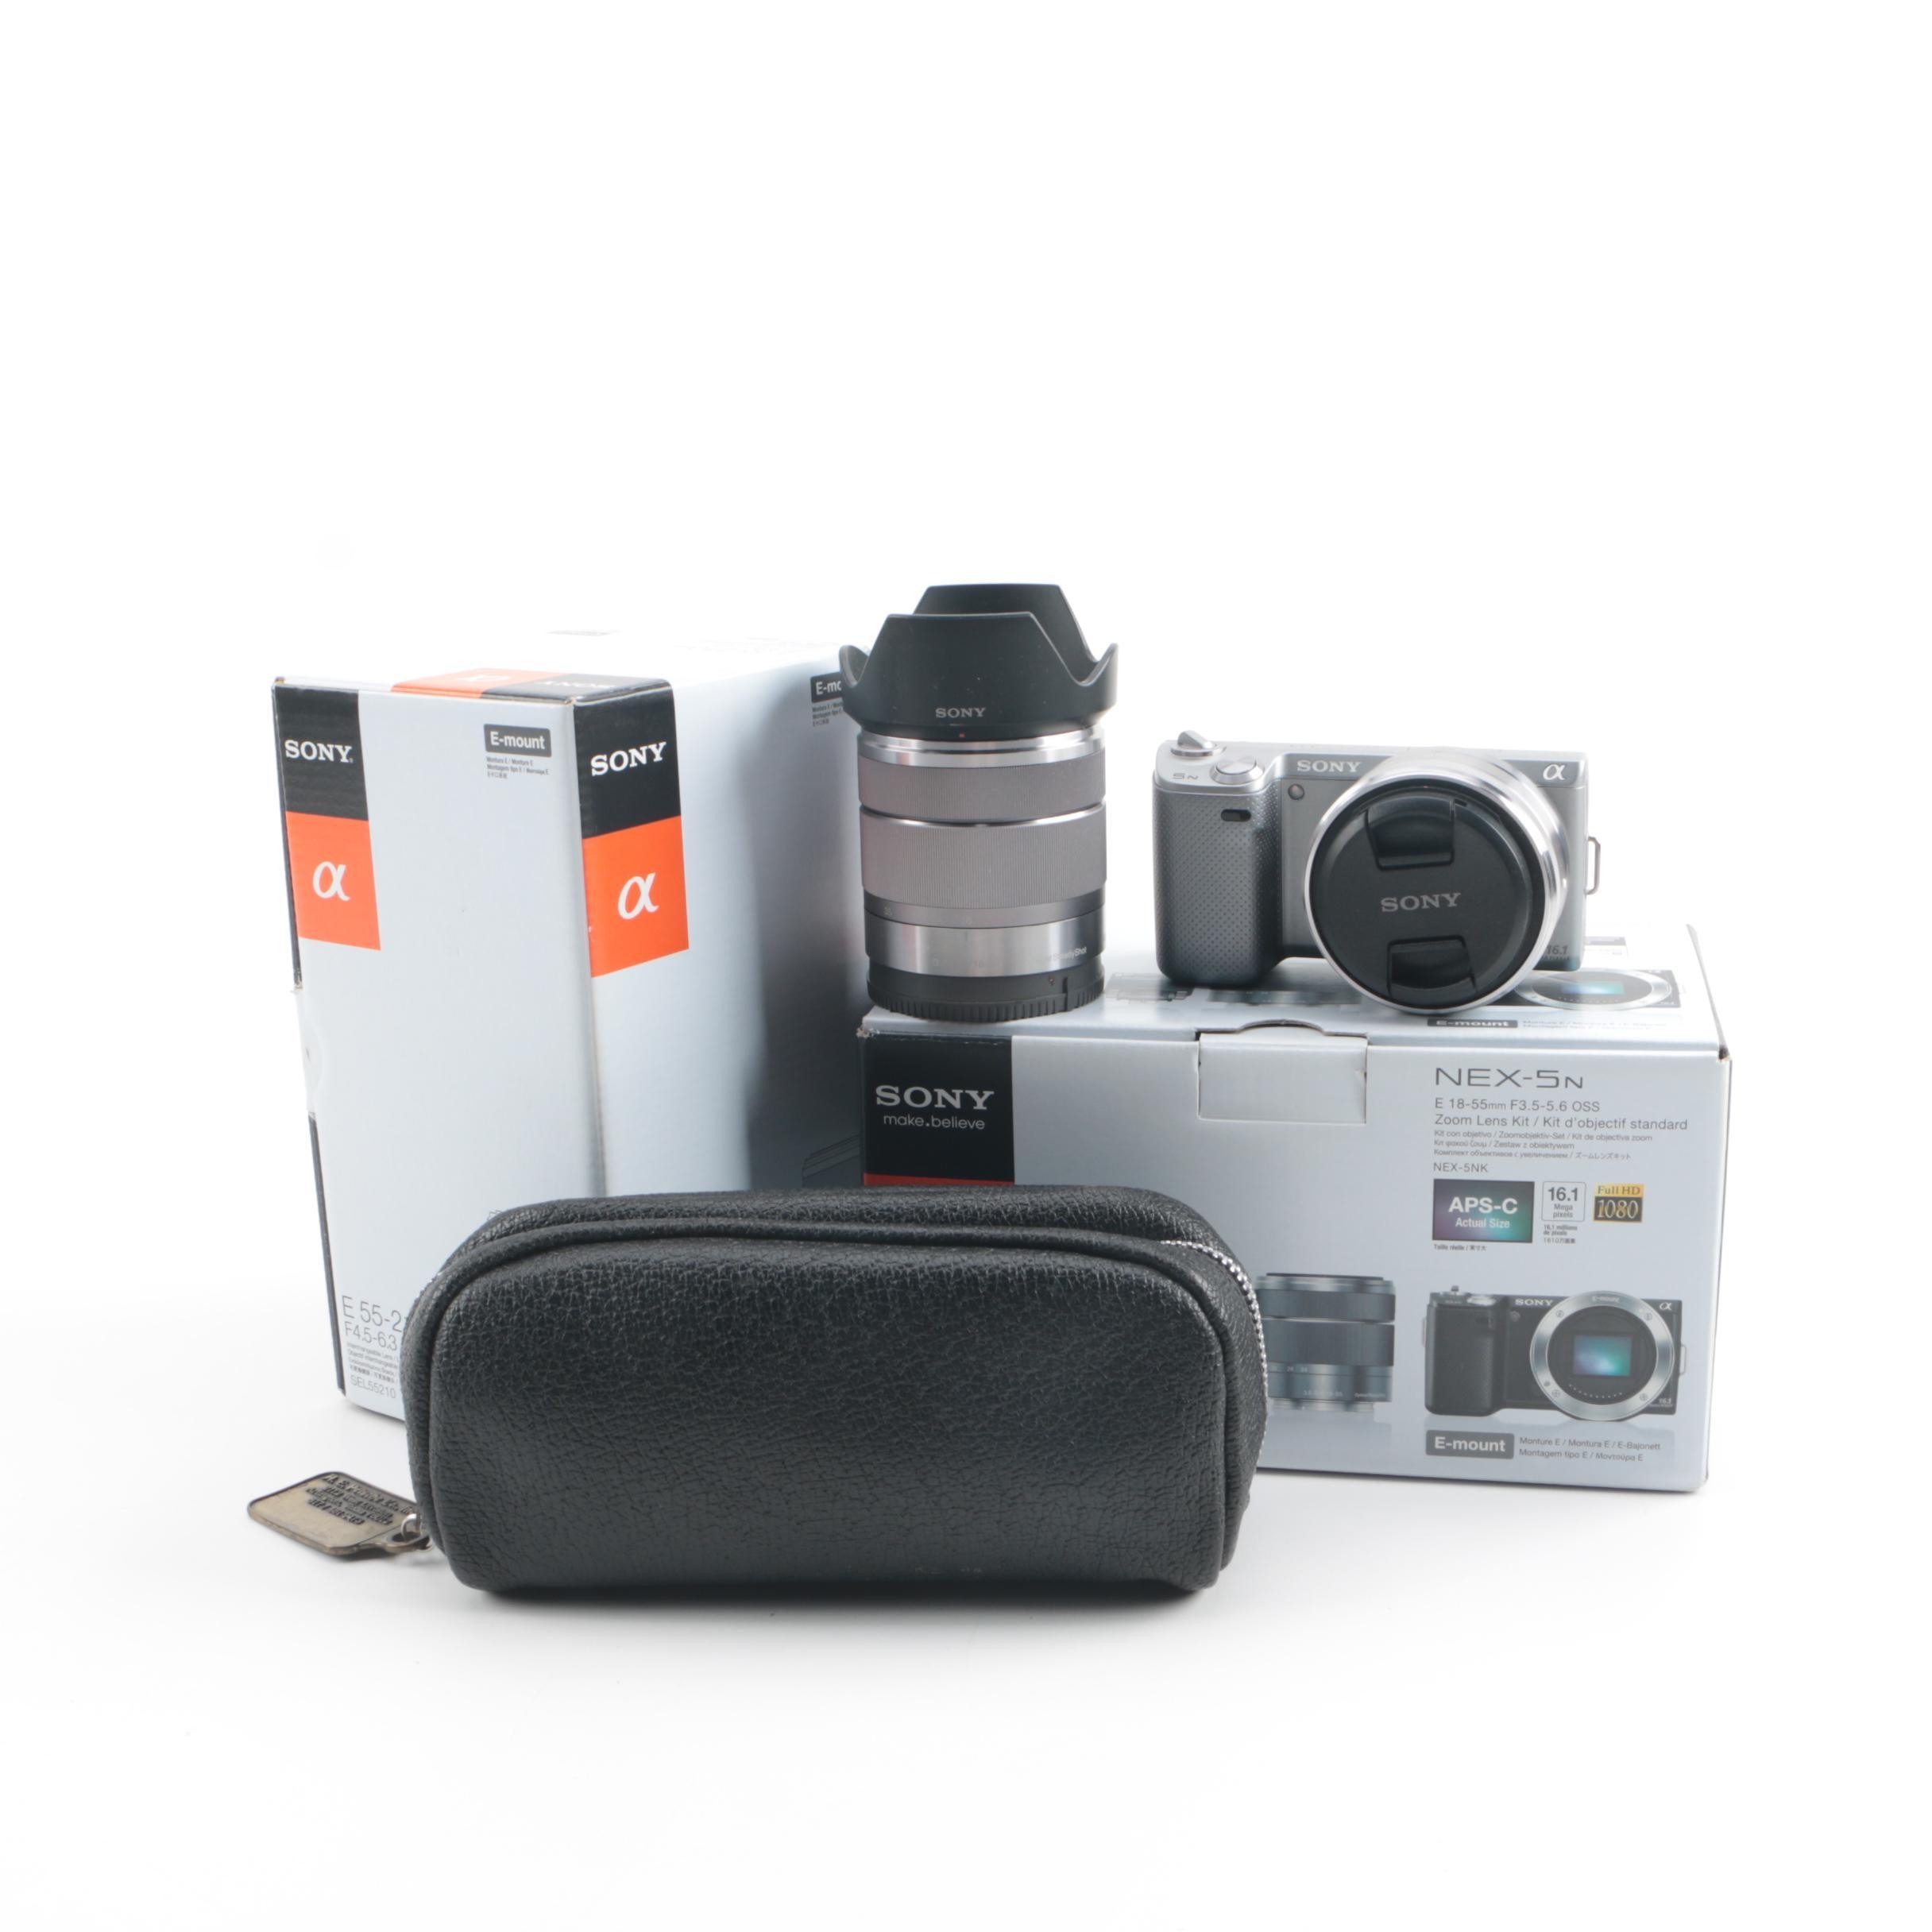 Sony NEX-5N HD AVCHD Digital Camera, Lenses and Case